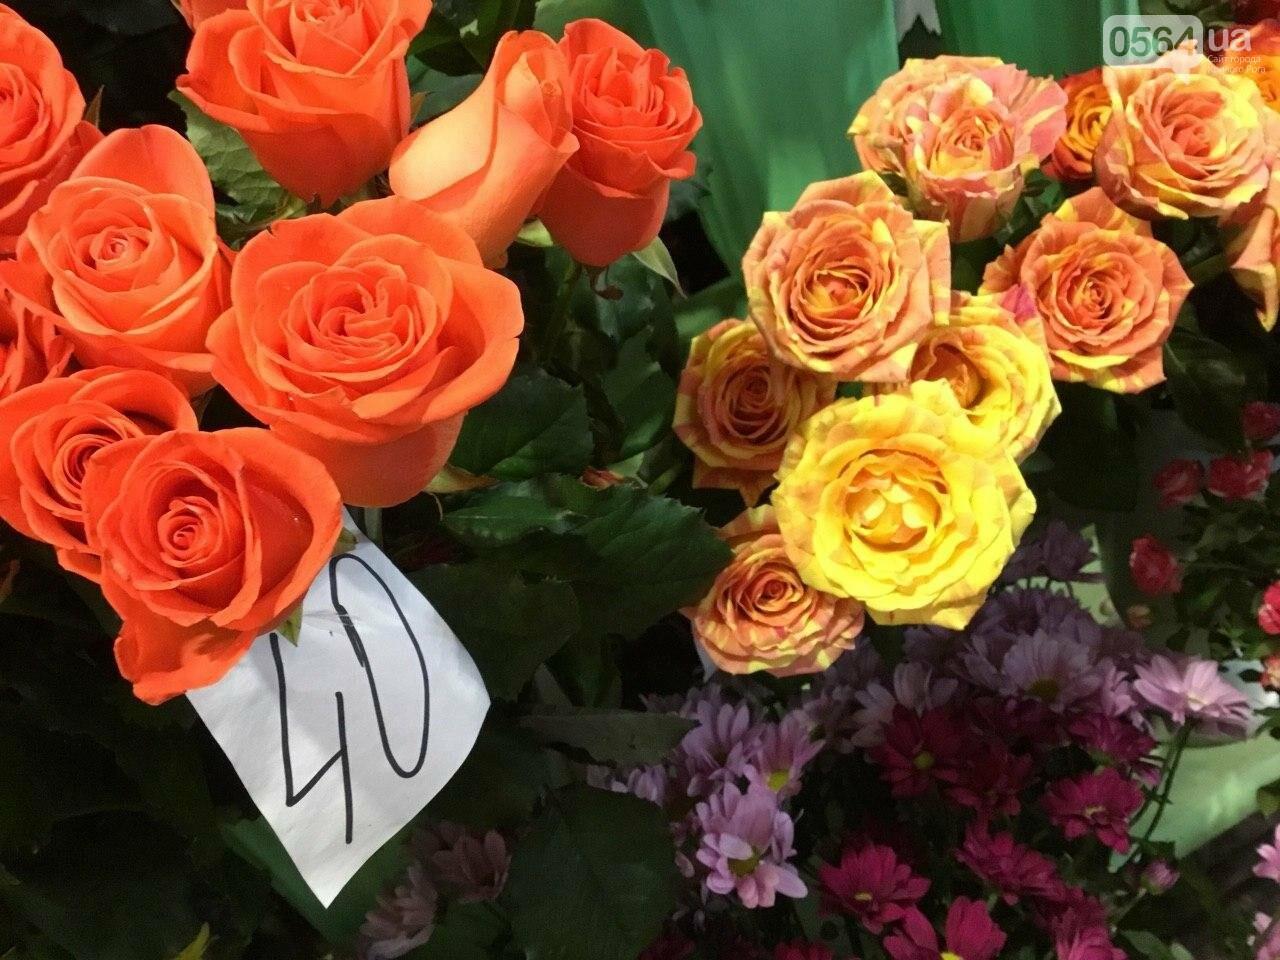 Сколько стоят примула, цикламен, мимоза? Обзор цен на цветы в Кривом Роге, - ФОТО, ВИДЕО, фото-4